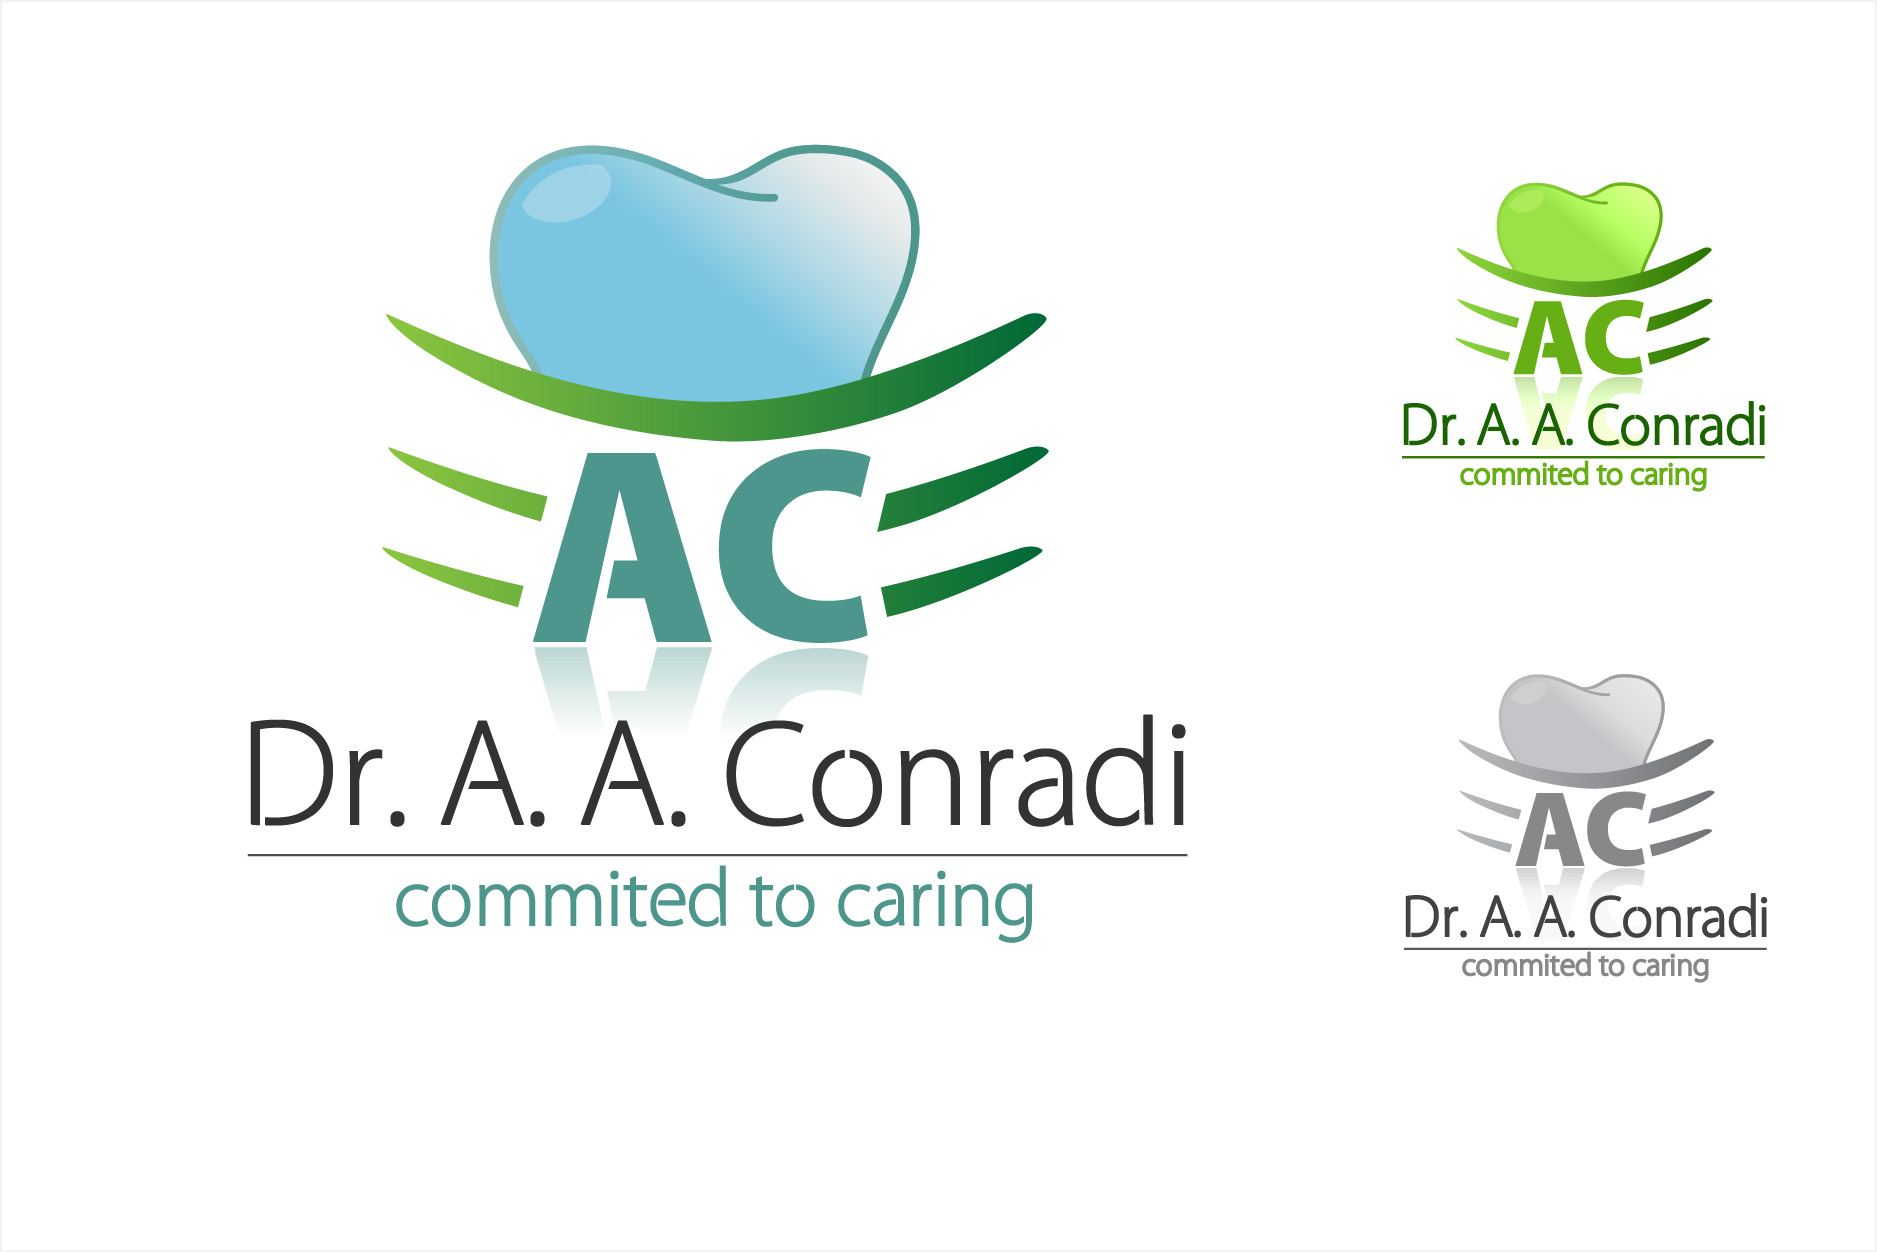 Logo Design by Private User - Entry No. 93 in the Logo Design Contest Unique Logo Design Wanted for Dr. A.A. Conradi.